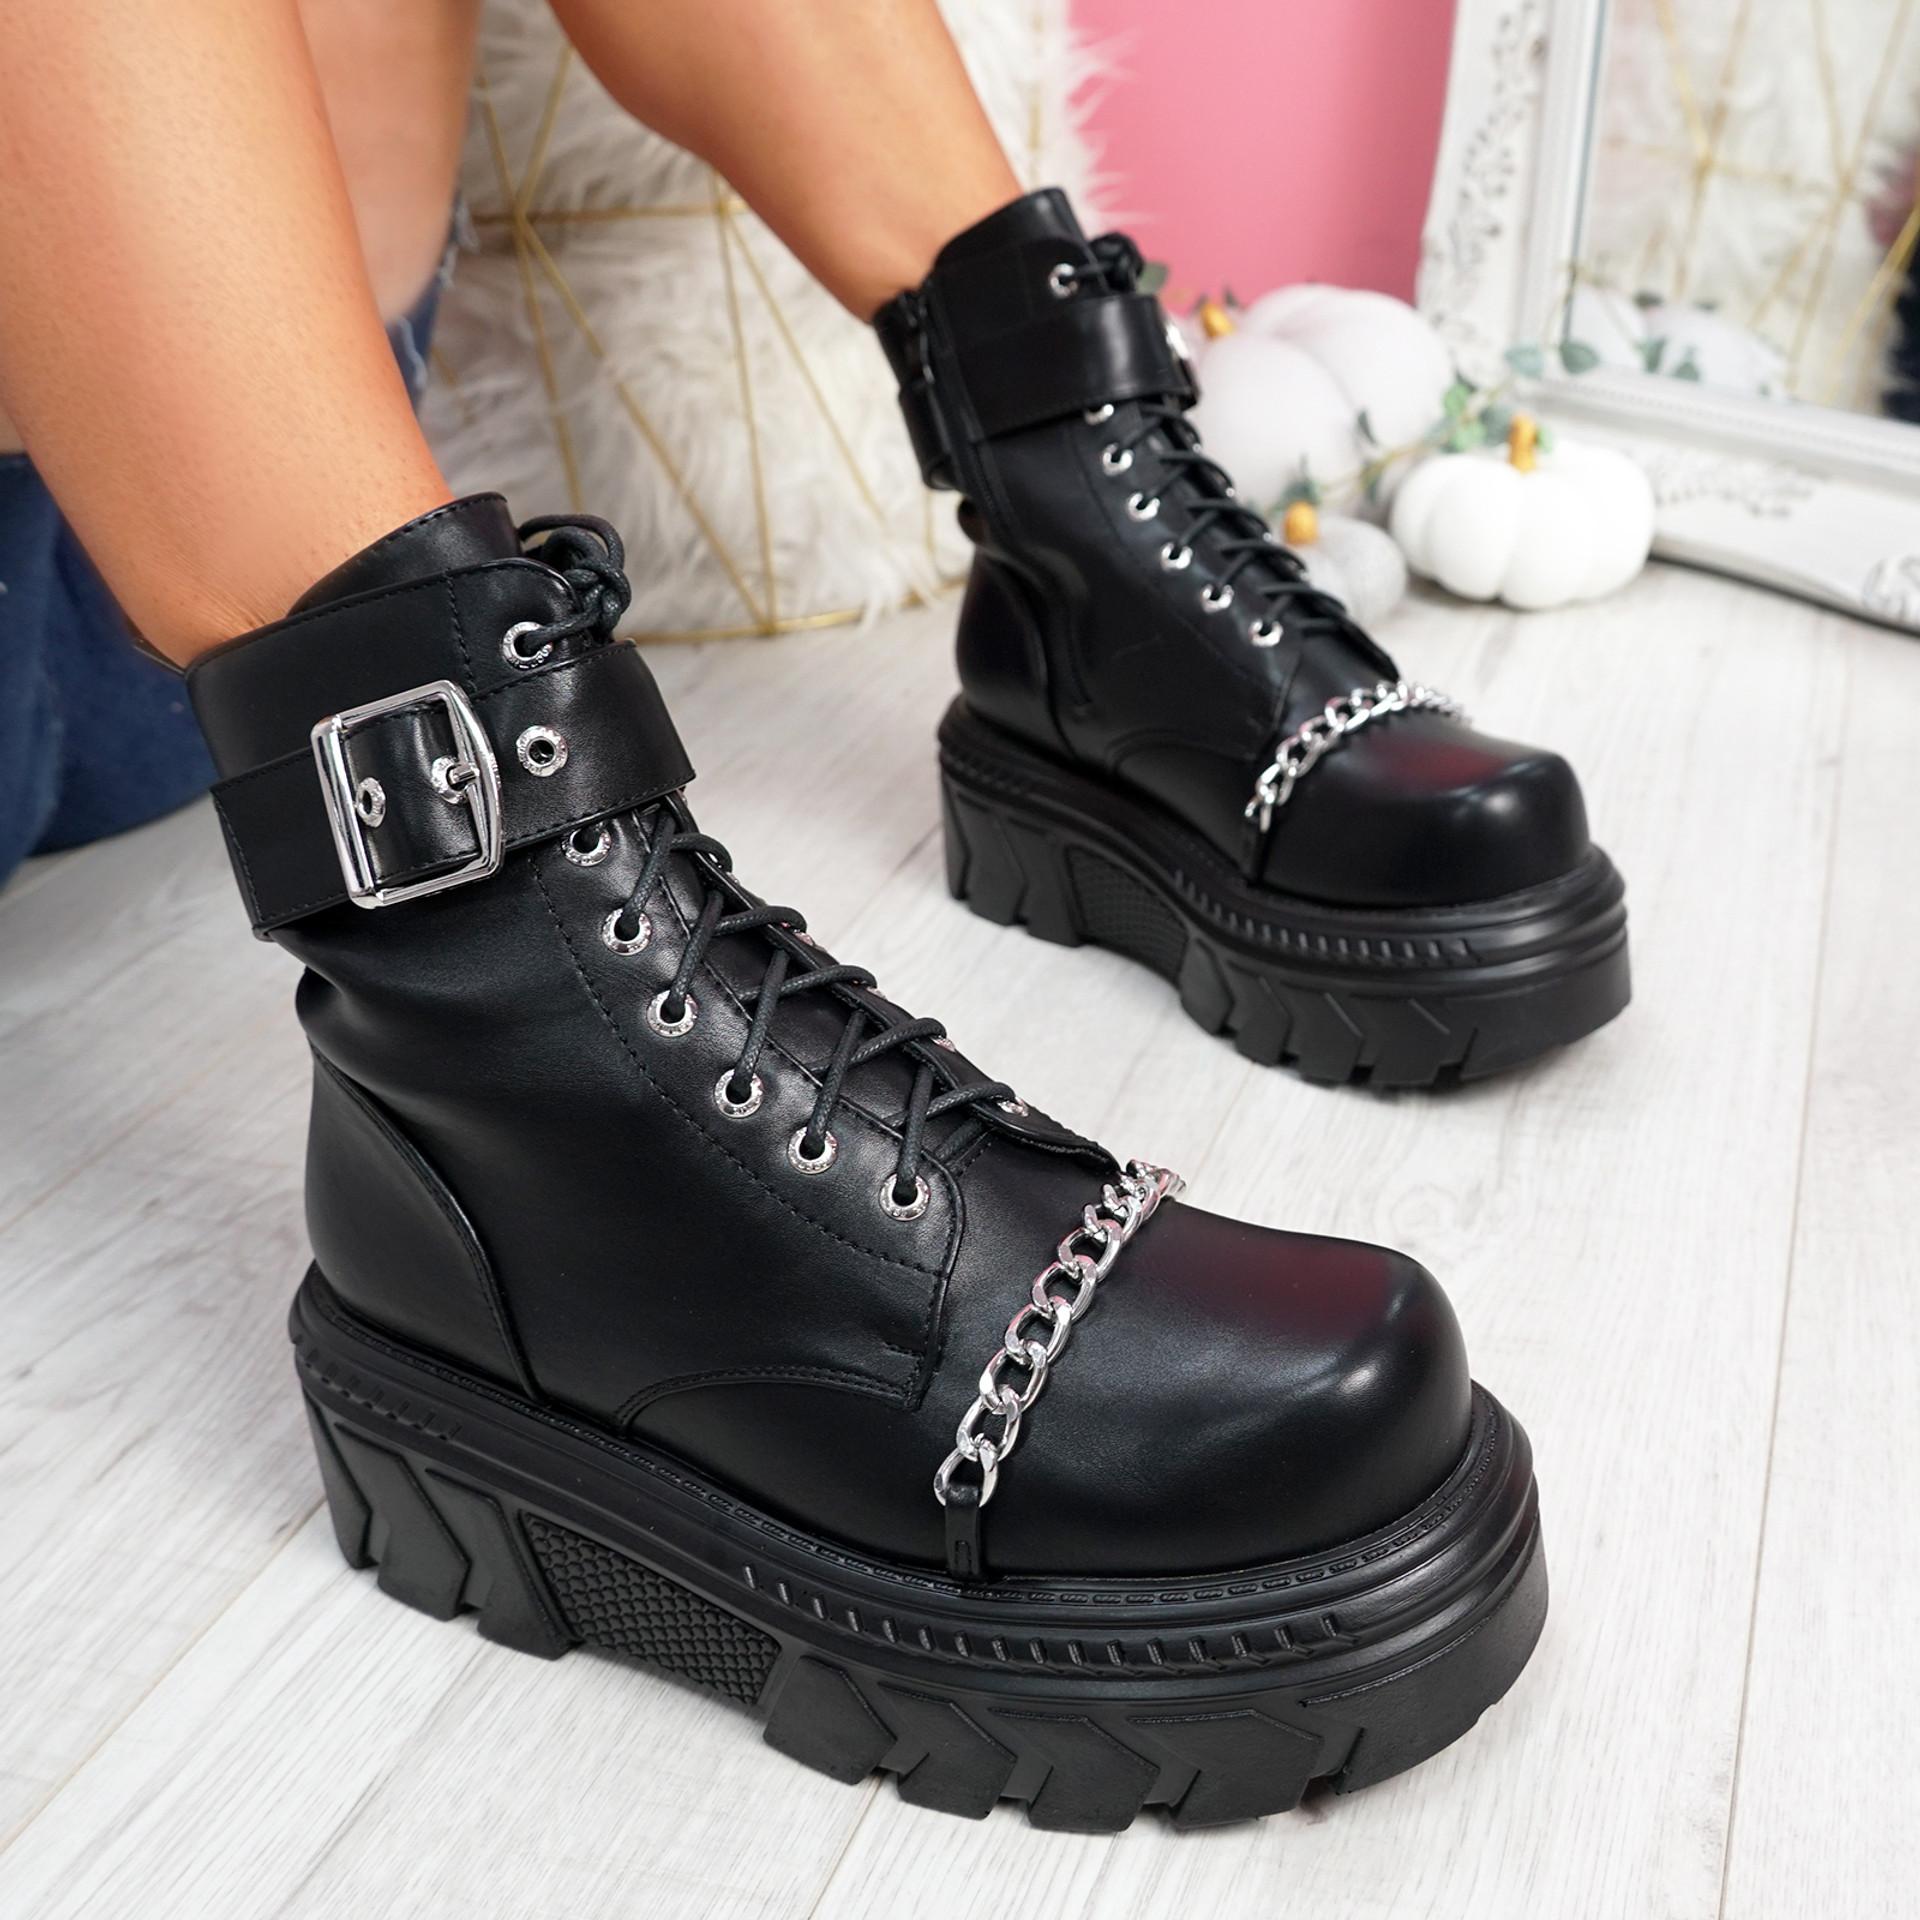 Keea Black Biker Ankle Boots